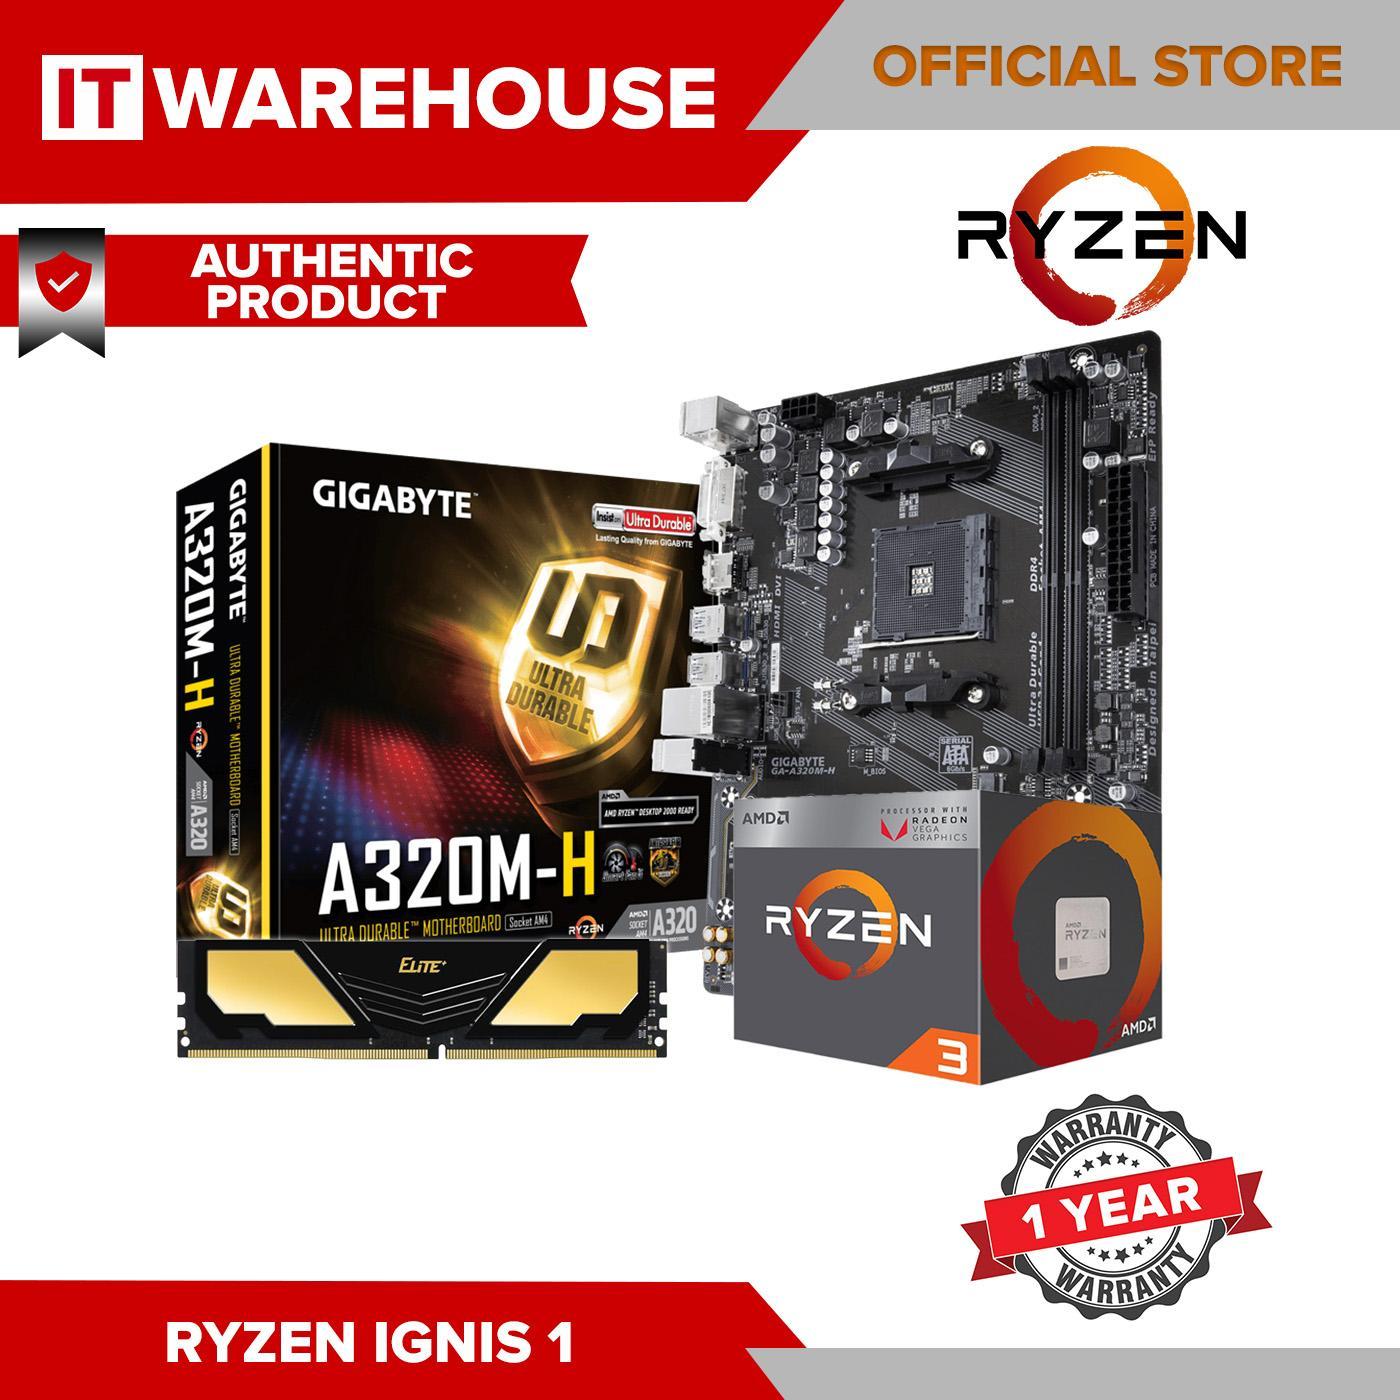 AMD Ryzen 3 2200G RYZ 3 VEGA IGNIS 1 Bundle Package Quad-Core 3 5 GHz  Socket AM4 65W with Radeon Vega 8 Graphics iGPU Desktop Processor DISKLESS  CPU